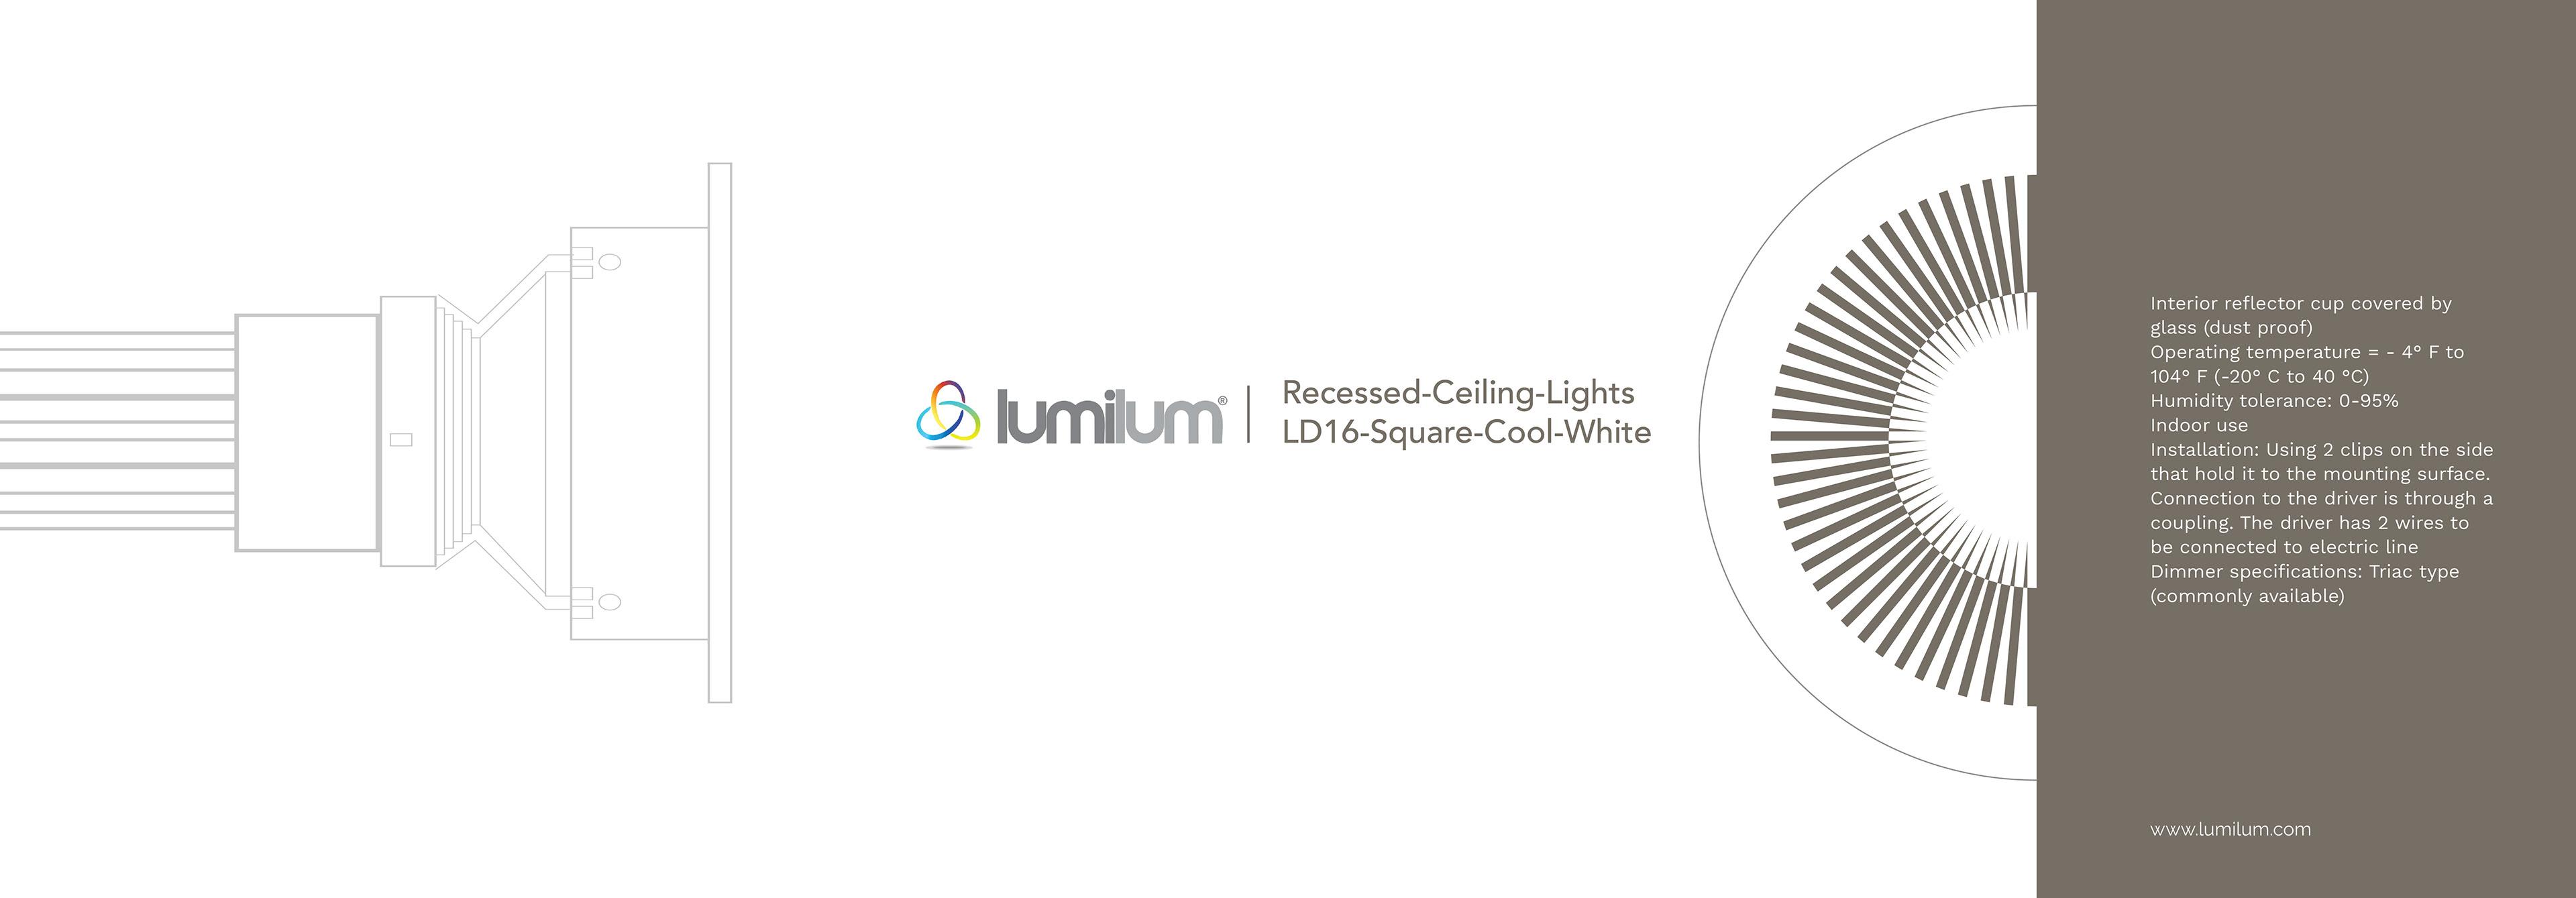 Folly Teko Luminum Ld16 Square Cool White Basic Triac Light Dimmer Circuit Diagram Concrete For Construction Materials